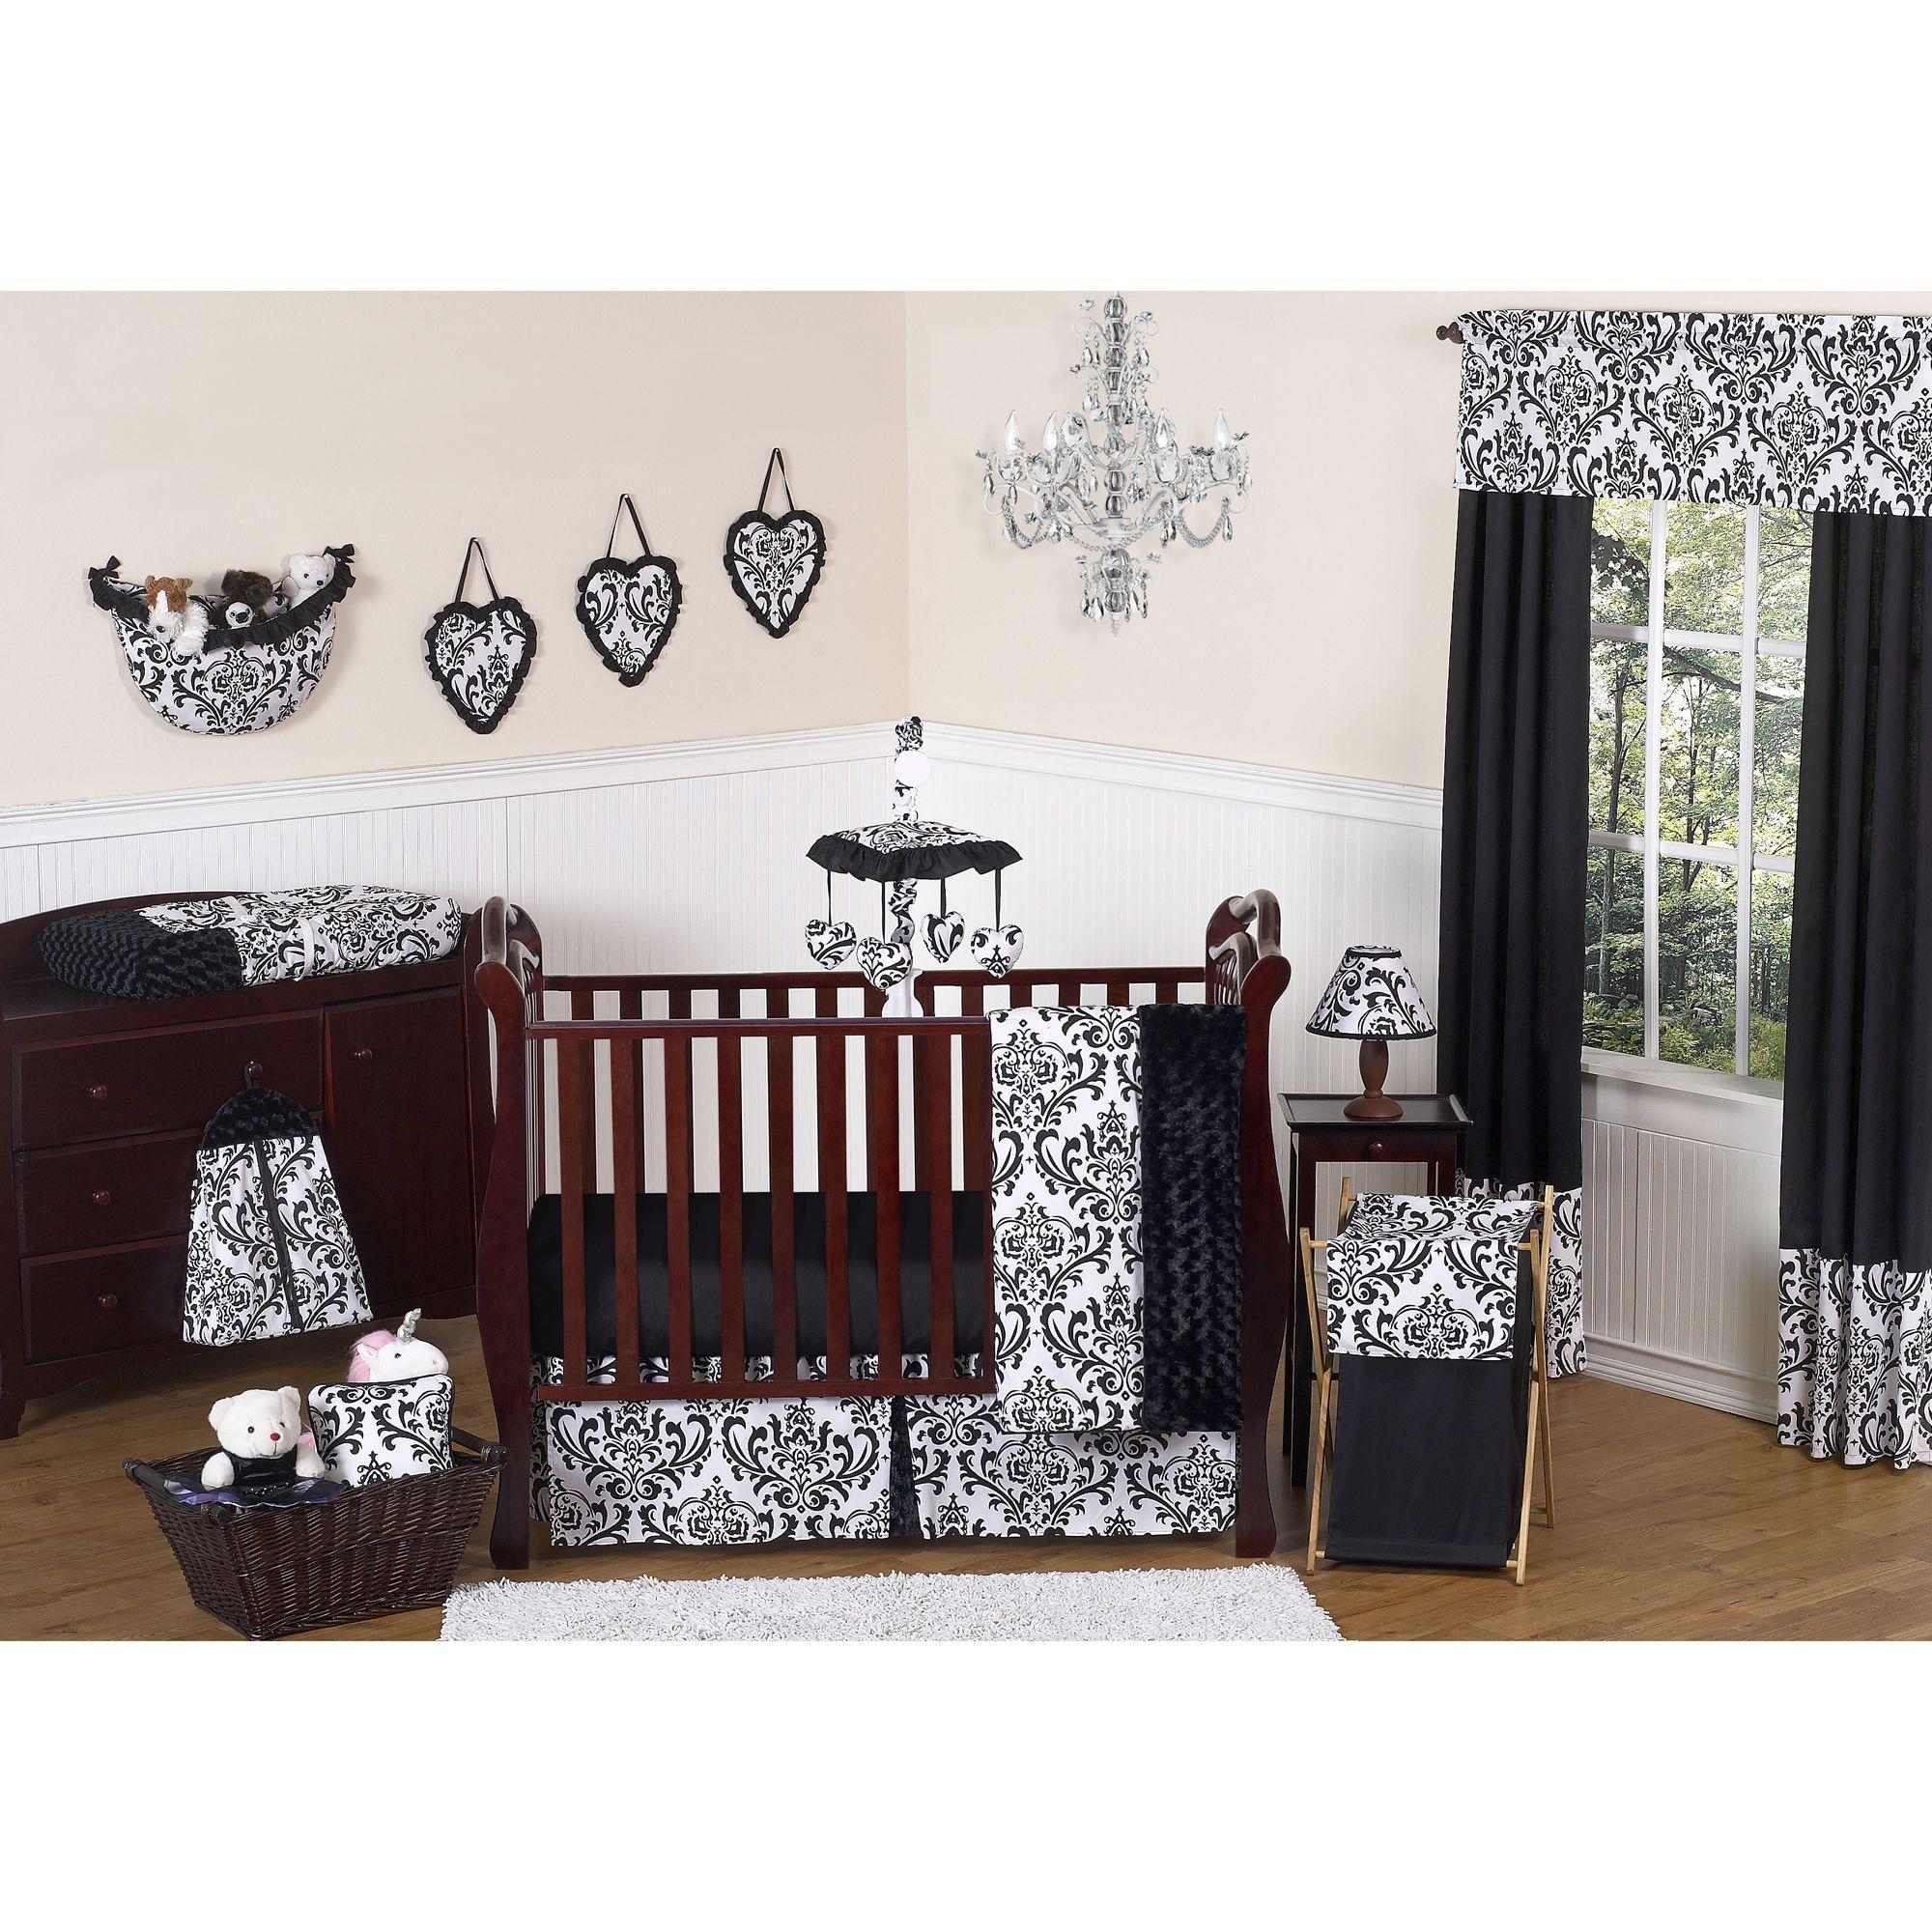 Sweet Jojo Designs Isabella Crib Bedding Collection in Black/White